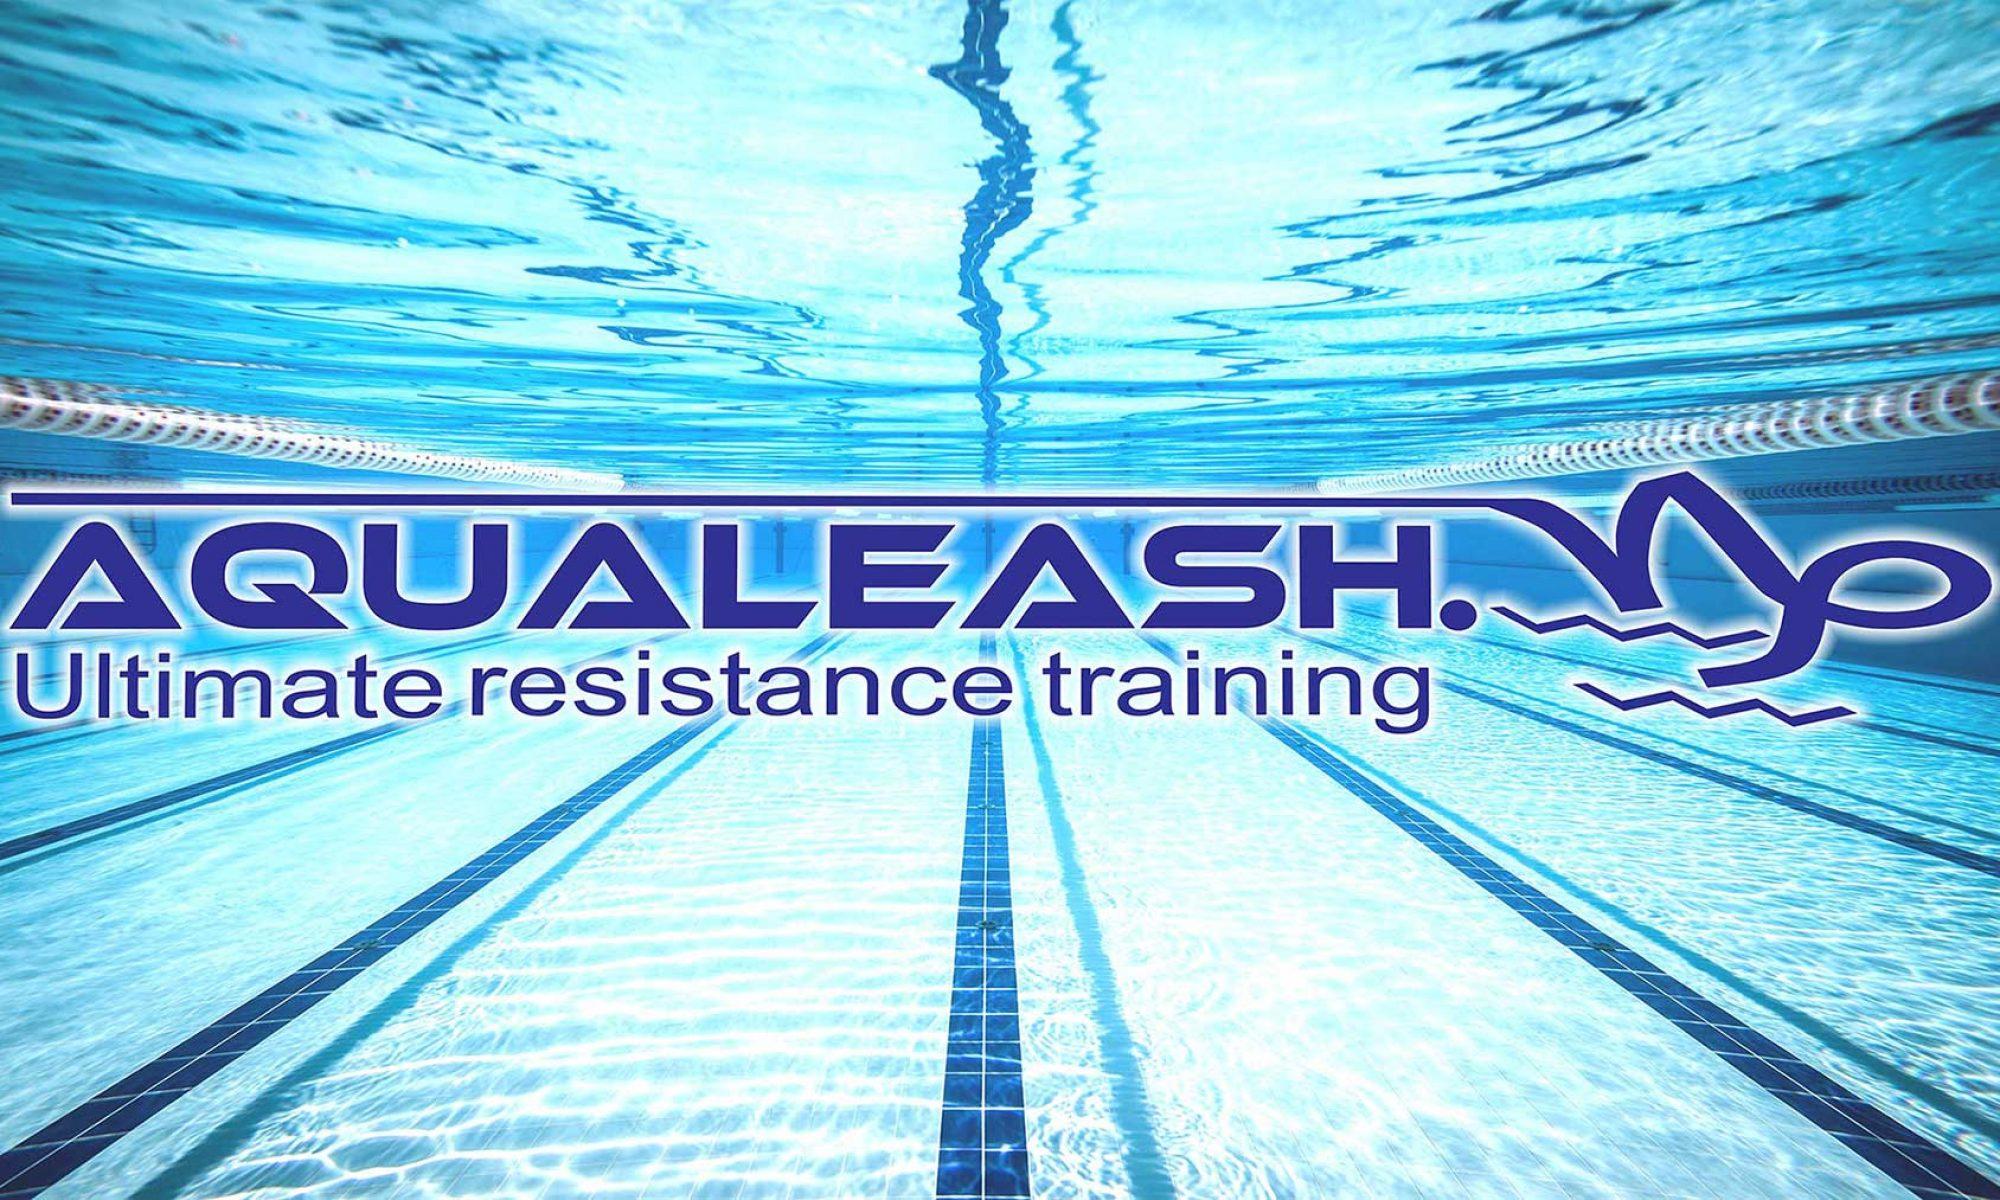 Aqualeash